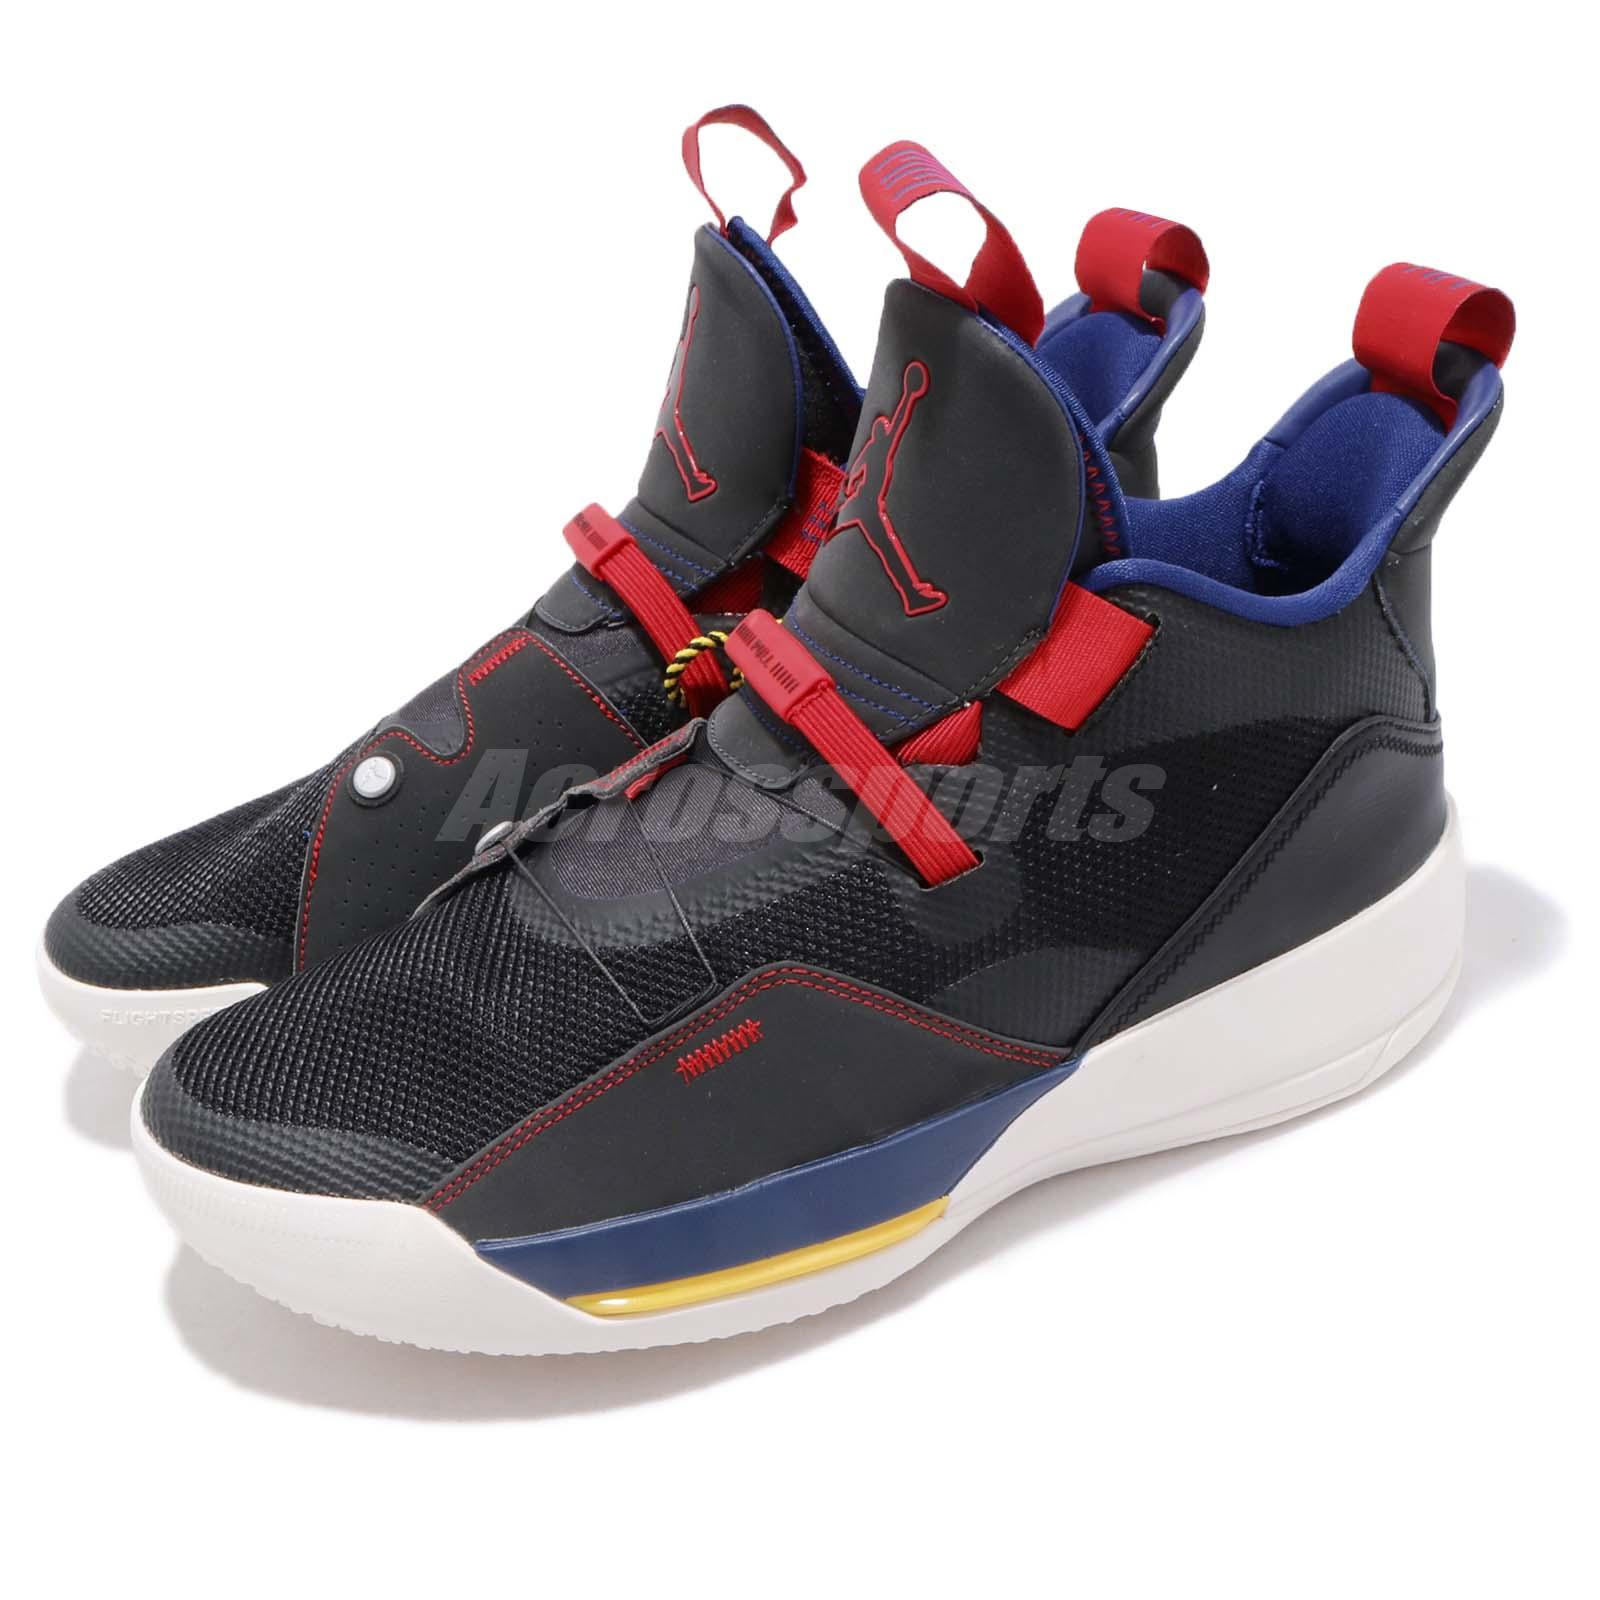 detailed look 6e899 e2e7e Details about Nike Air Jordan 33 Tech Pack XXXIII Black Dark Smoke Grey Sail  AJ33 BV5072-001